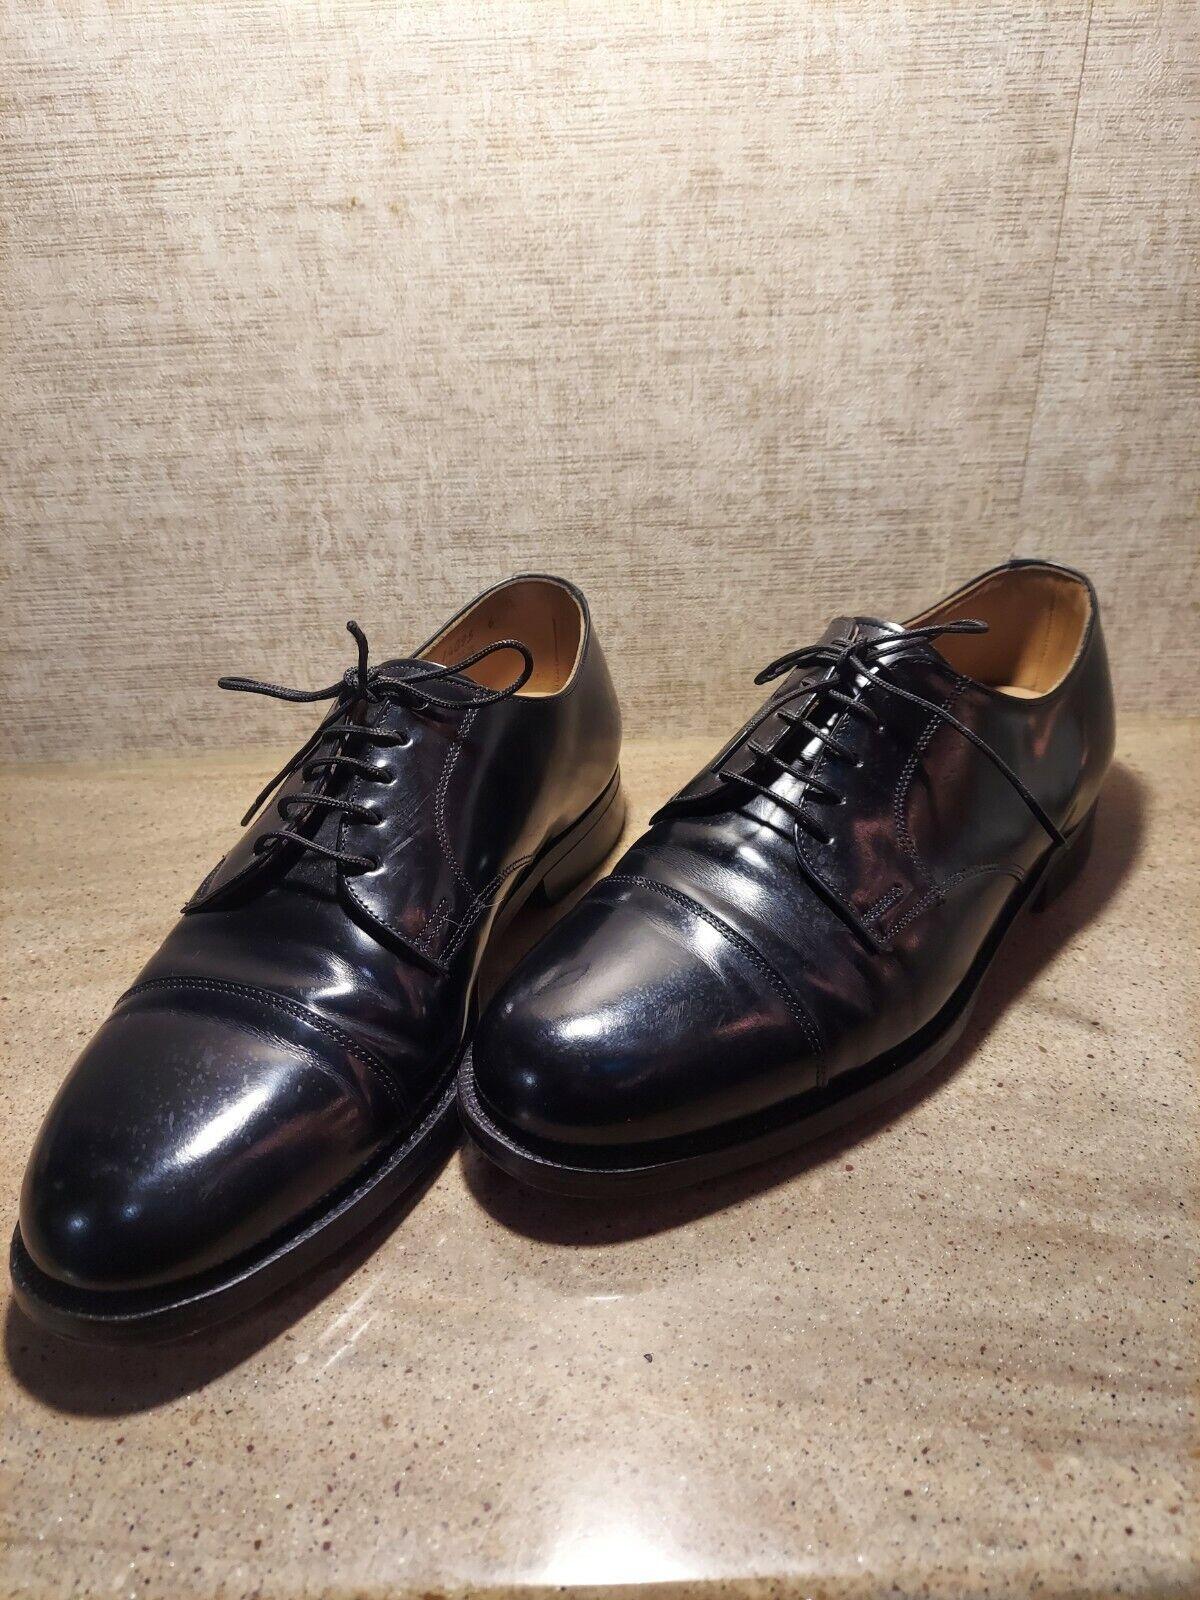 Johnston & Murphy Black Leather Cap Toe Oxfords Optiflex Men's Size 8.5 D